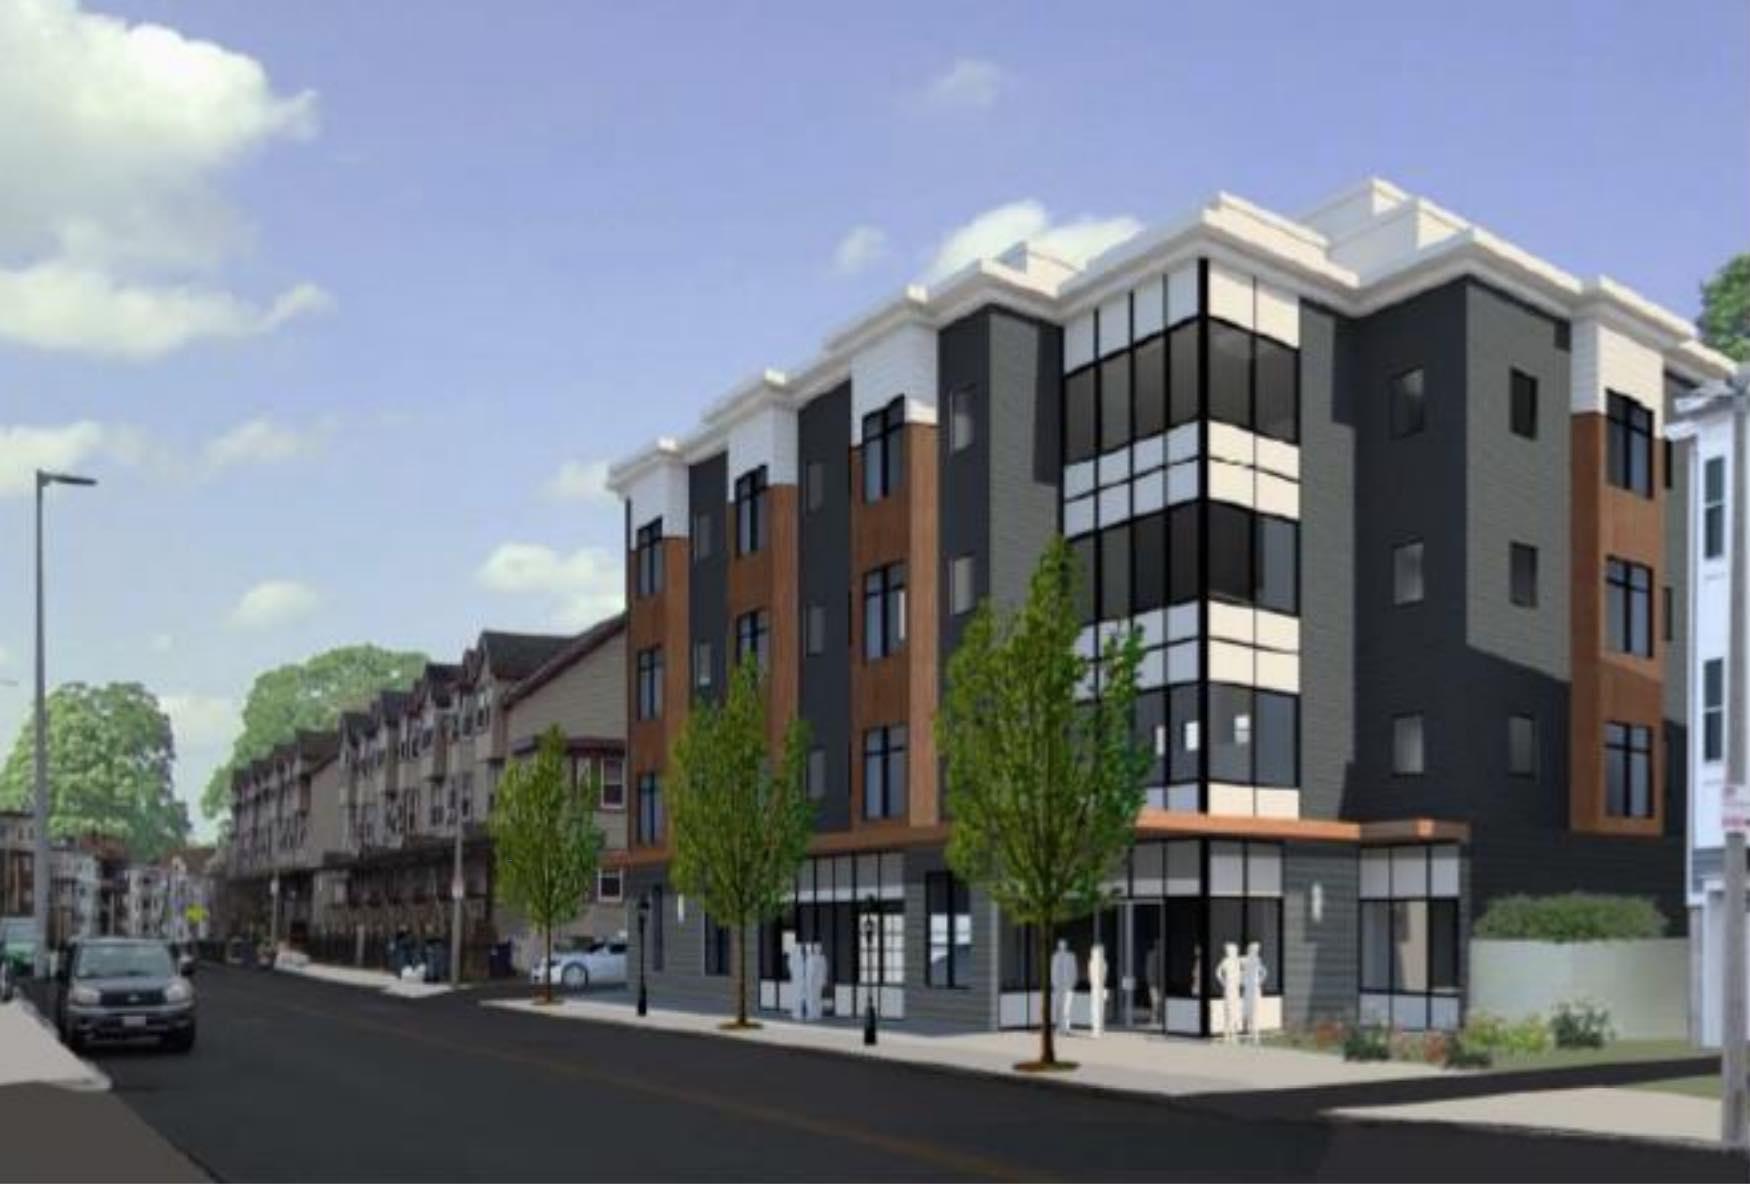 Bed rock geneva 185 191 geneva avenue dorchester boston proposed residential apartment development building project